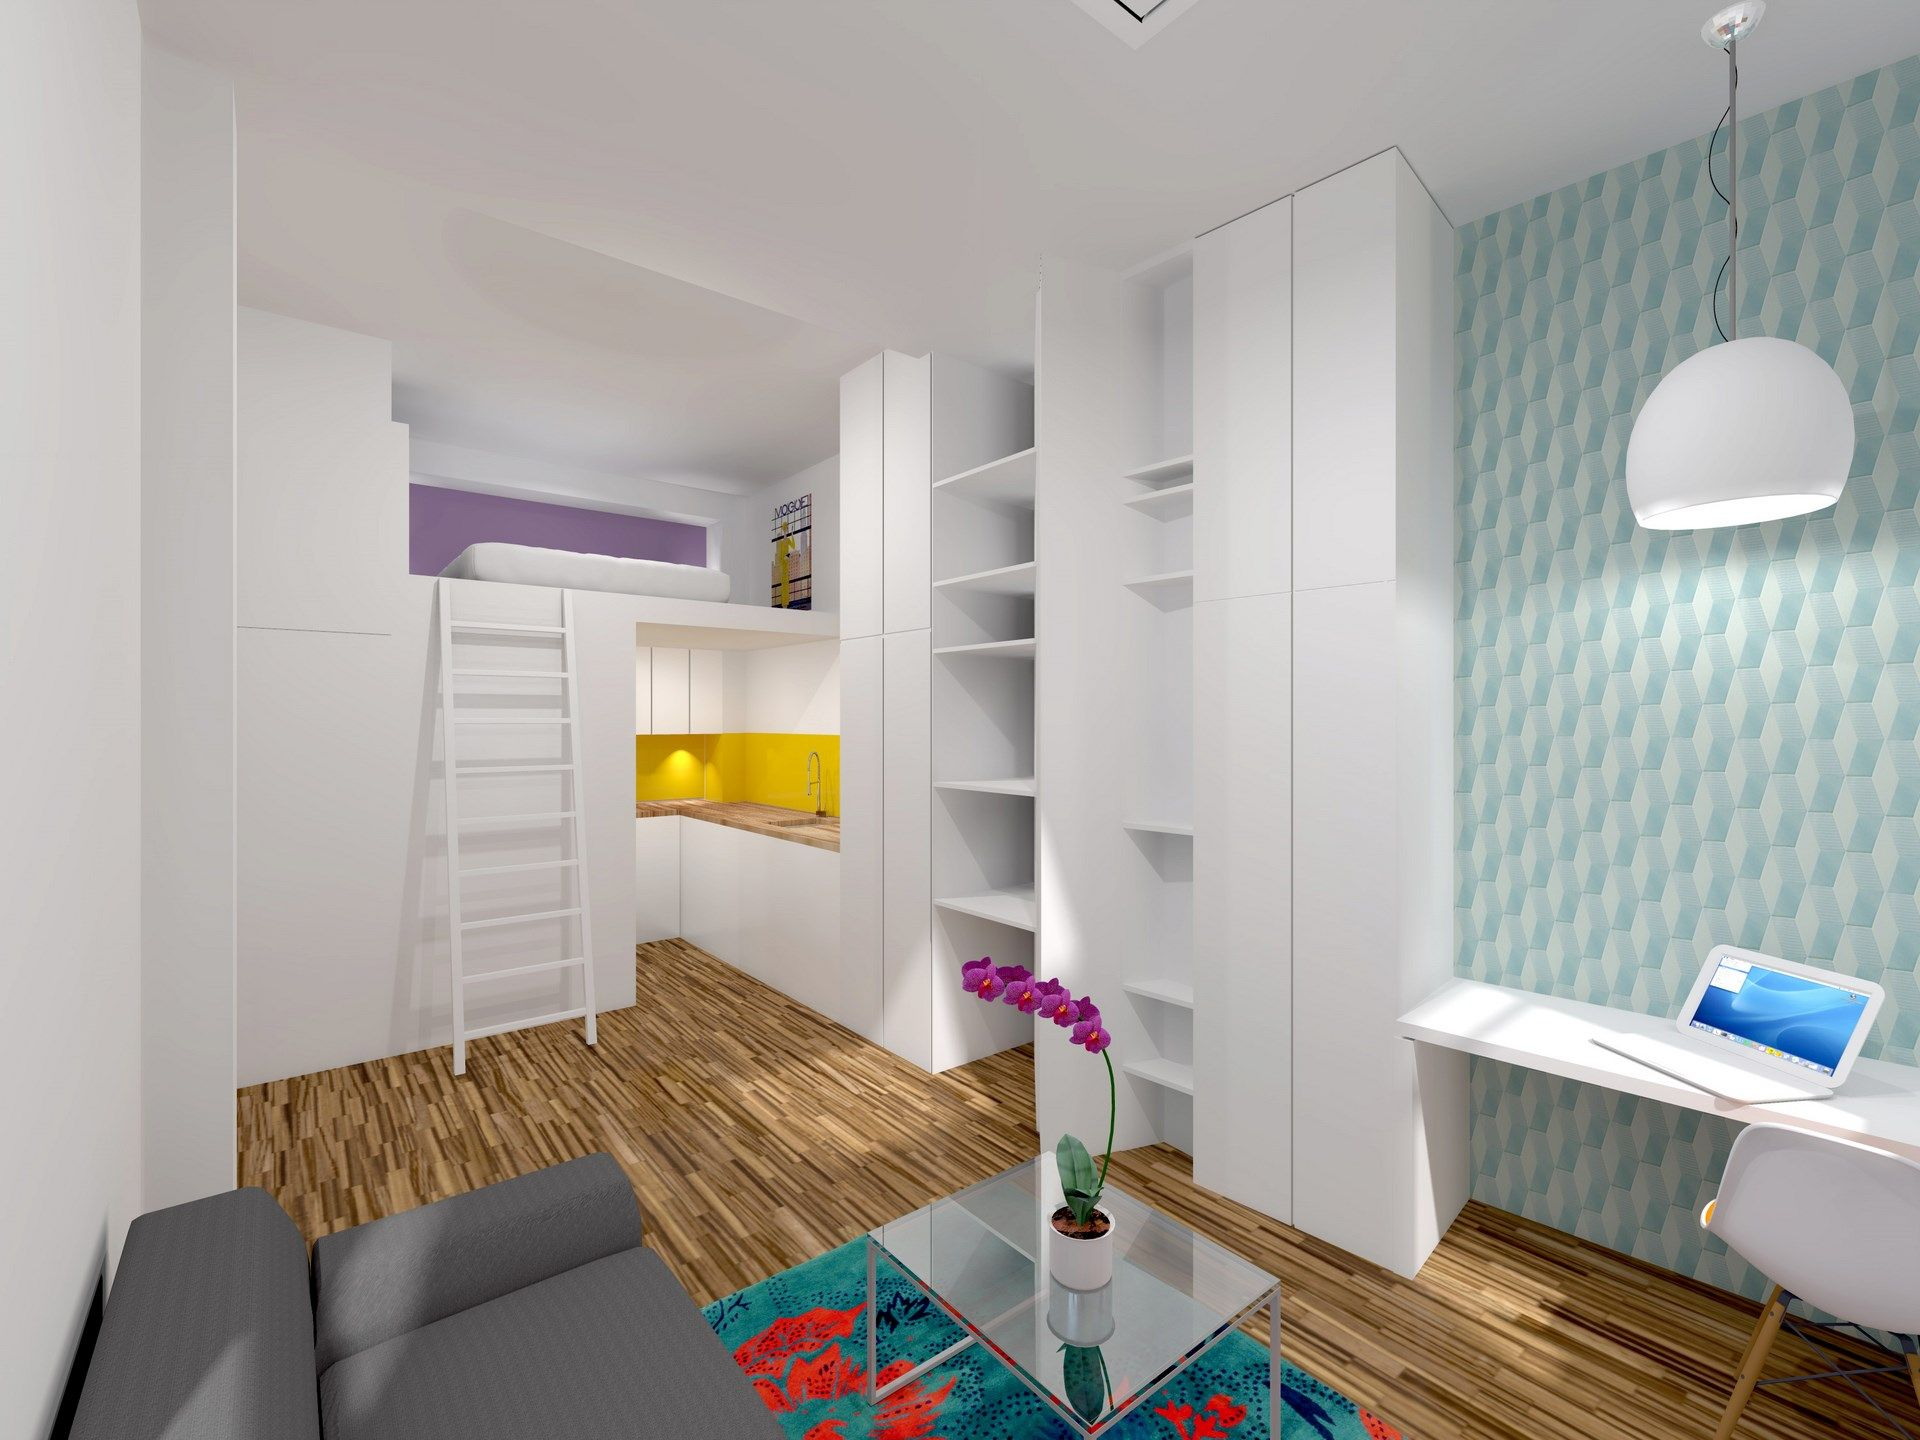 amenagement studio mezzanine dressing agence avous | Studio ...